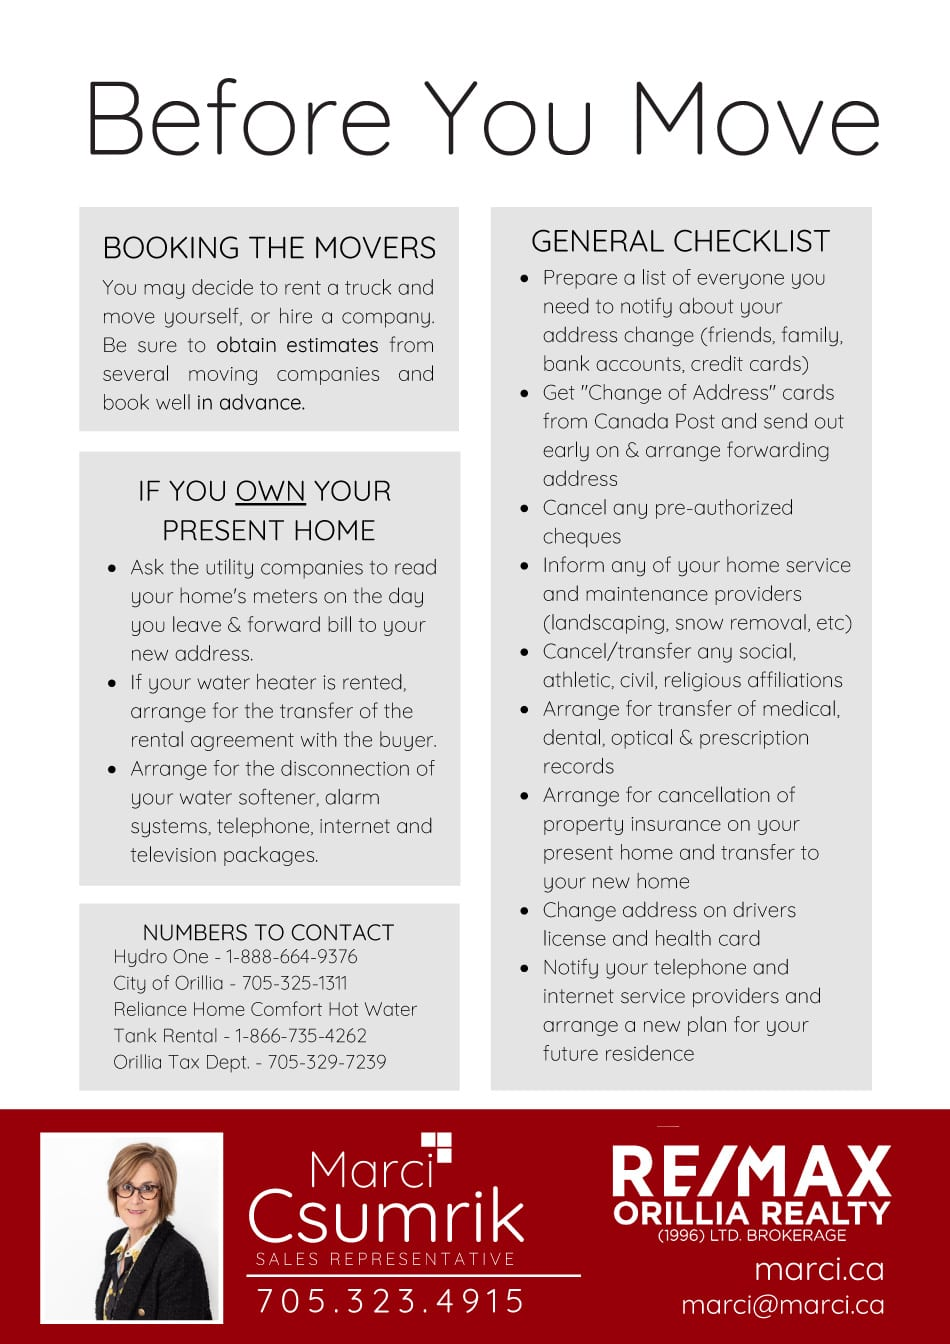 Before You Move Checklist